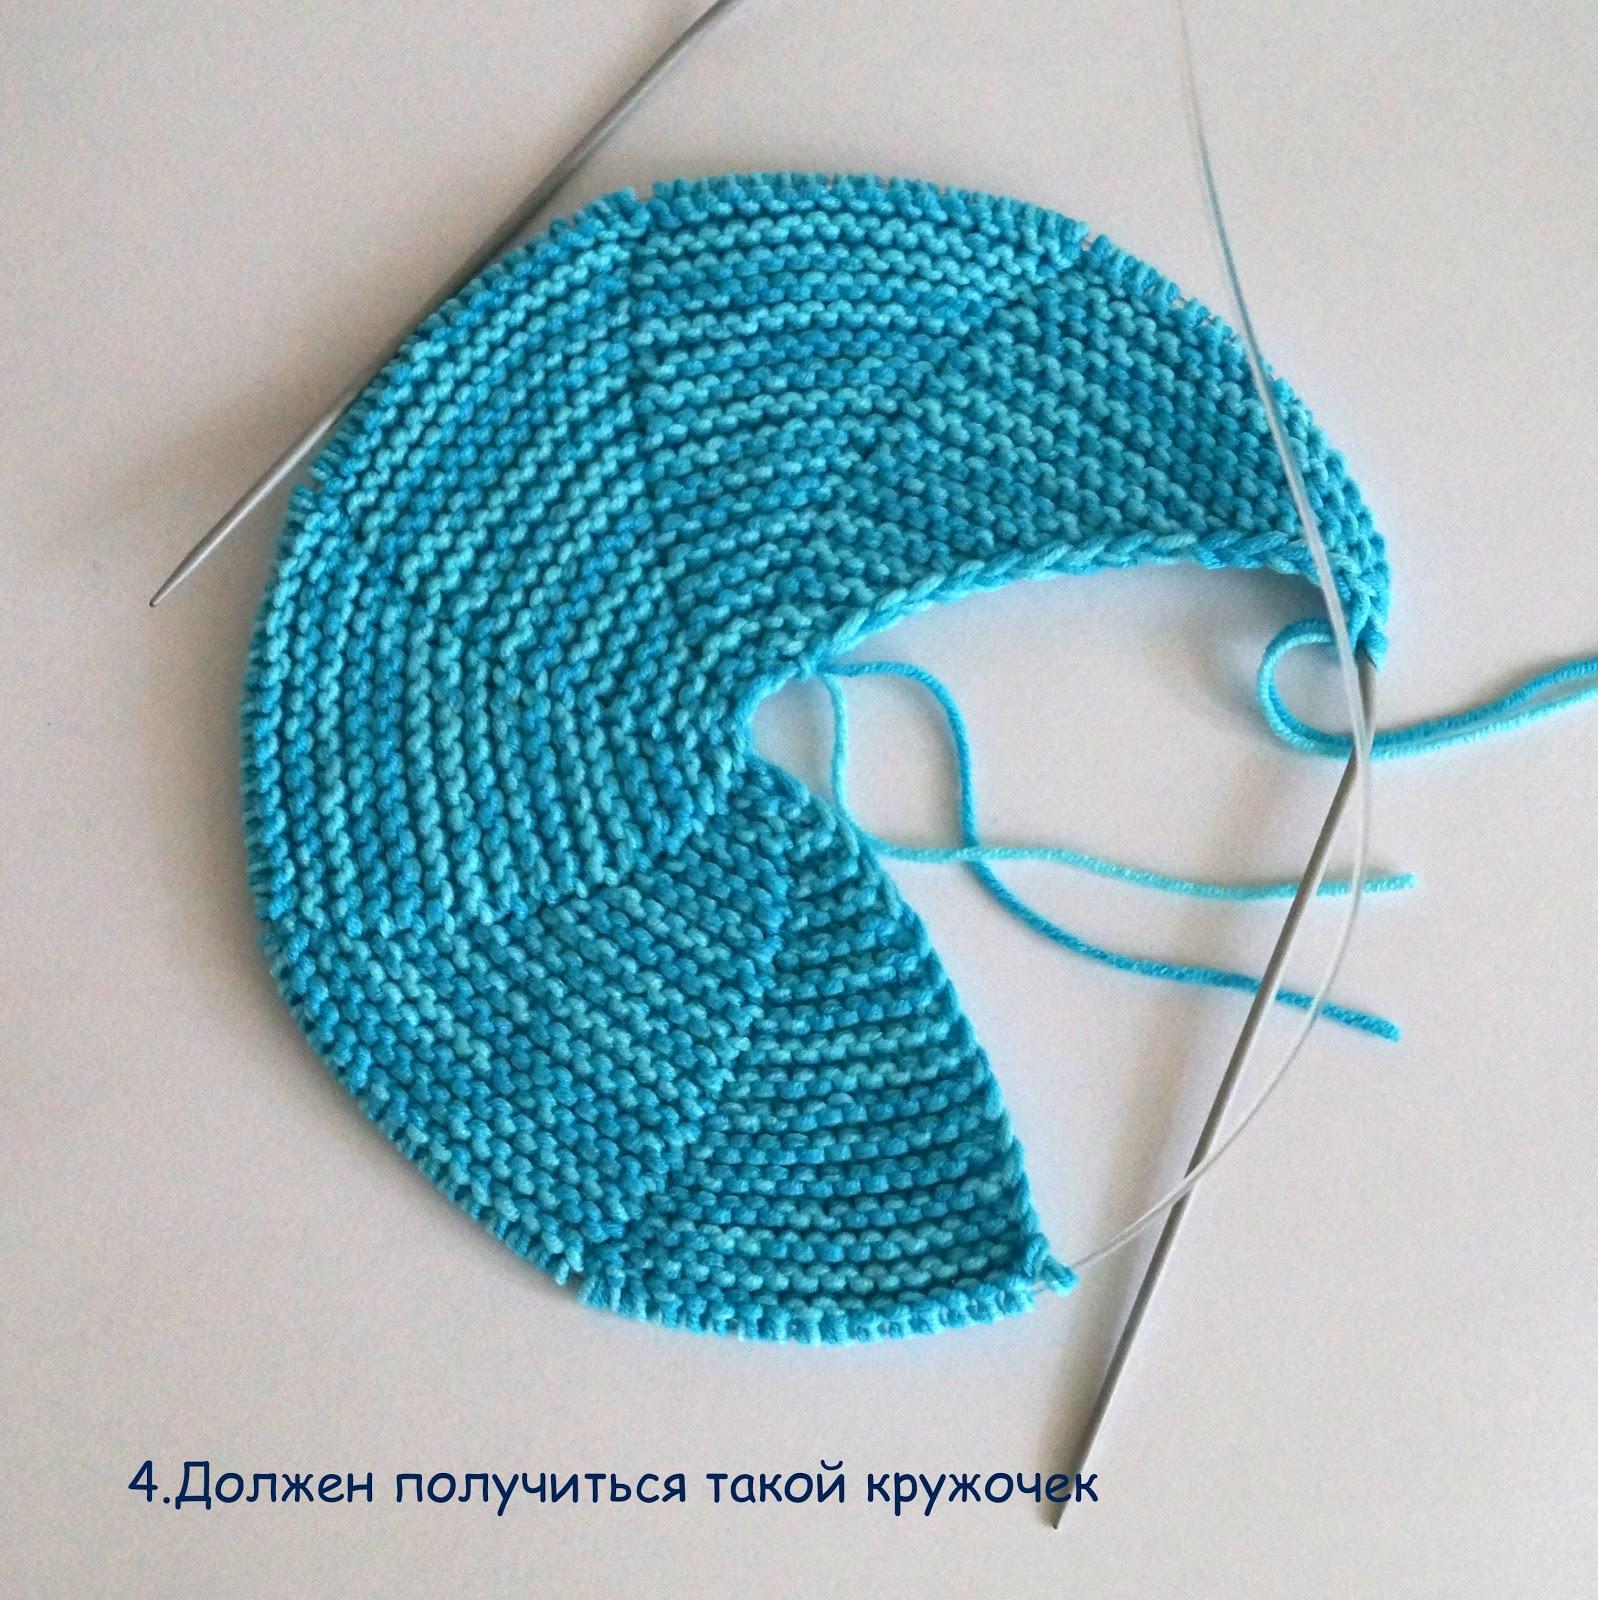 Как вязать спицами макушку шапки